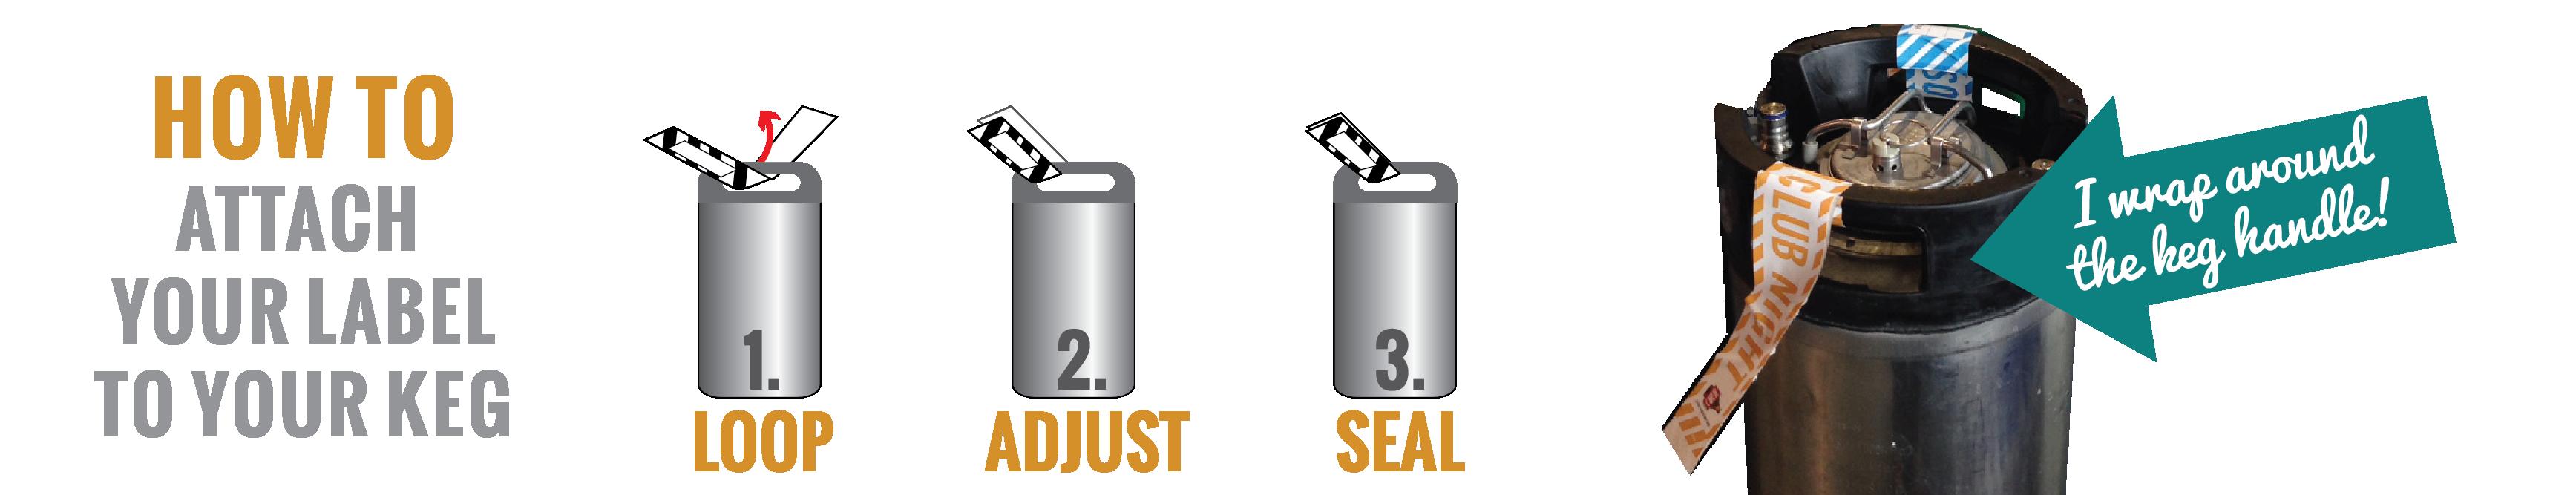 keg labeling info